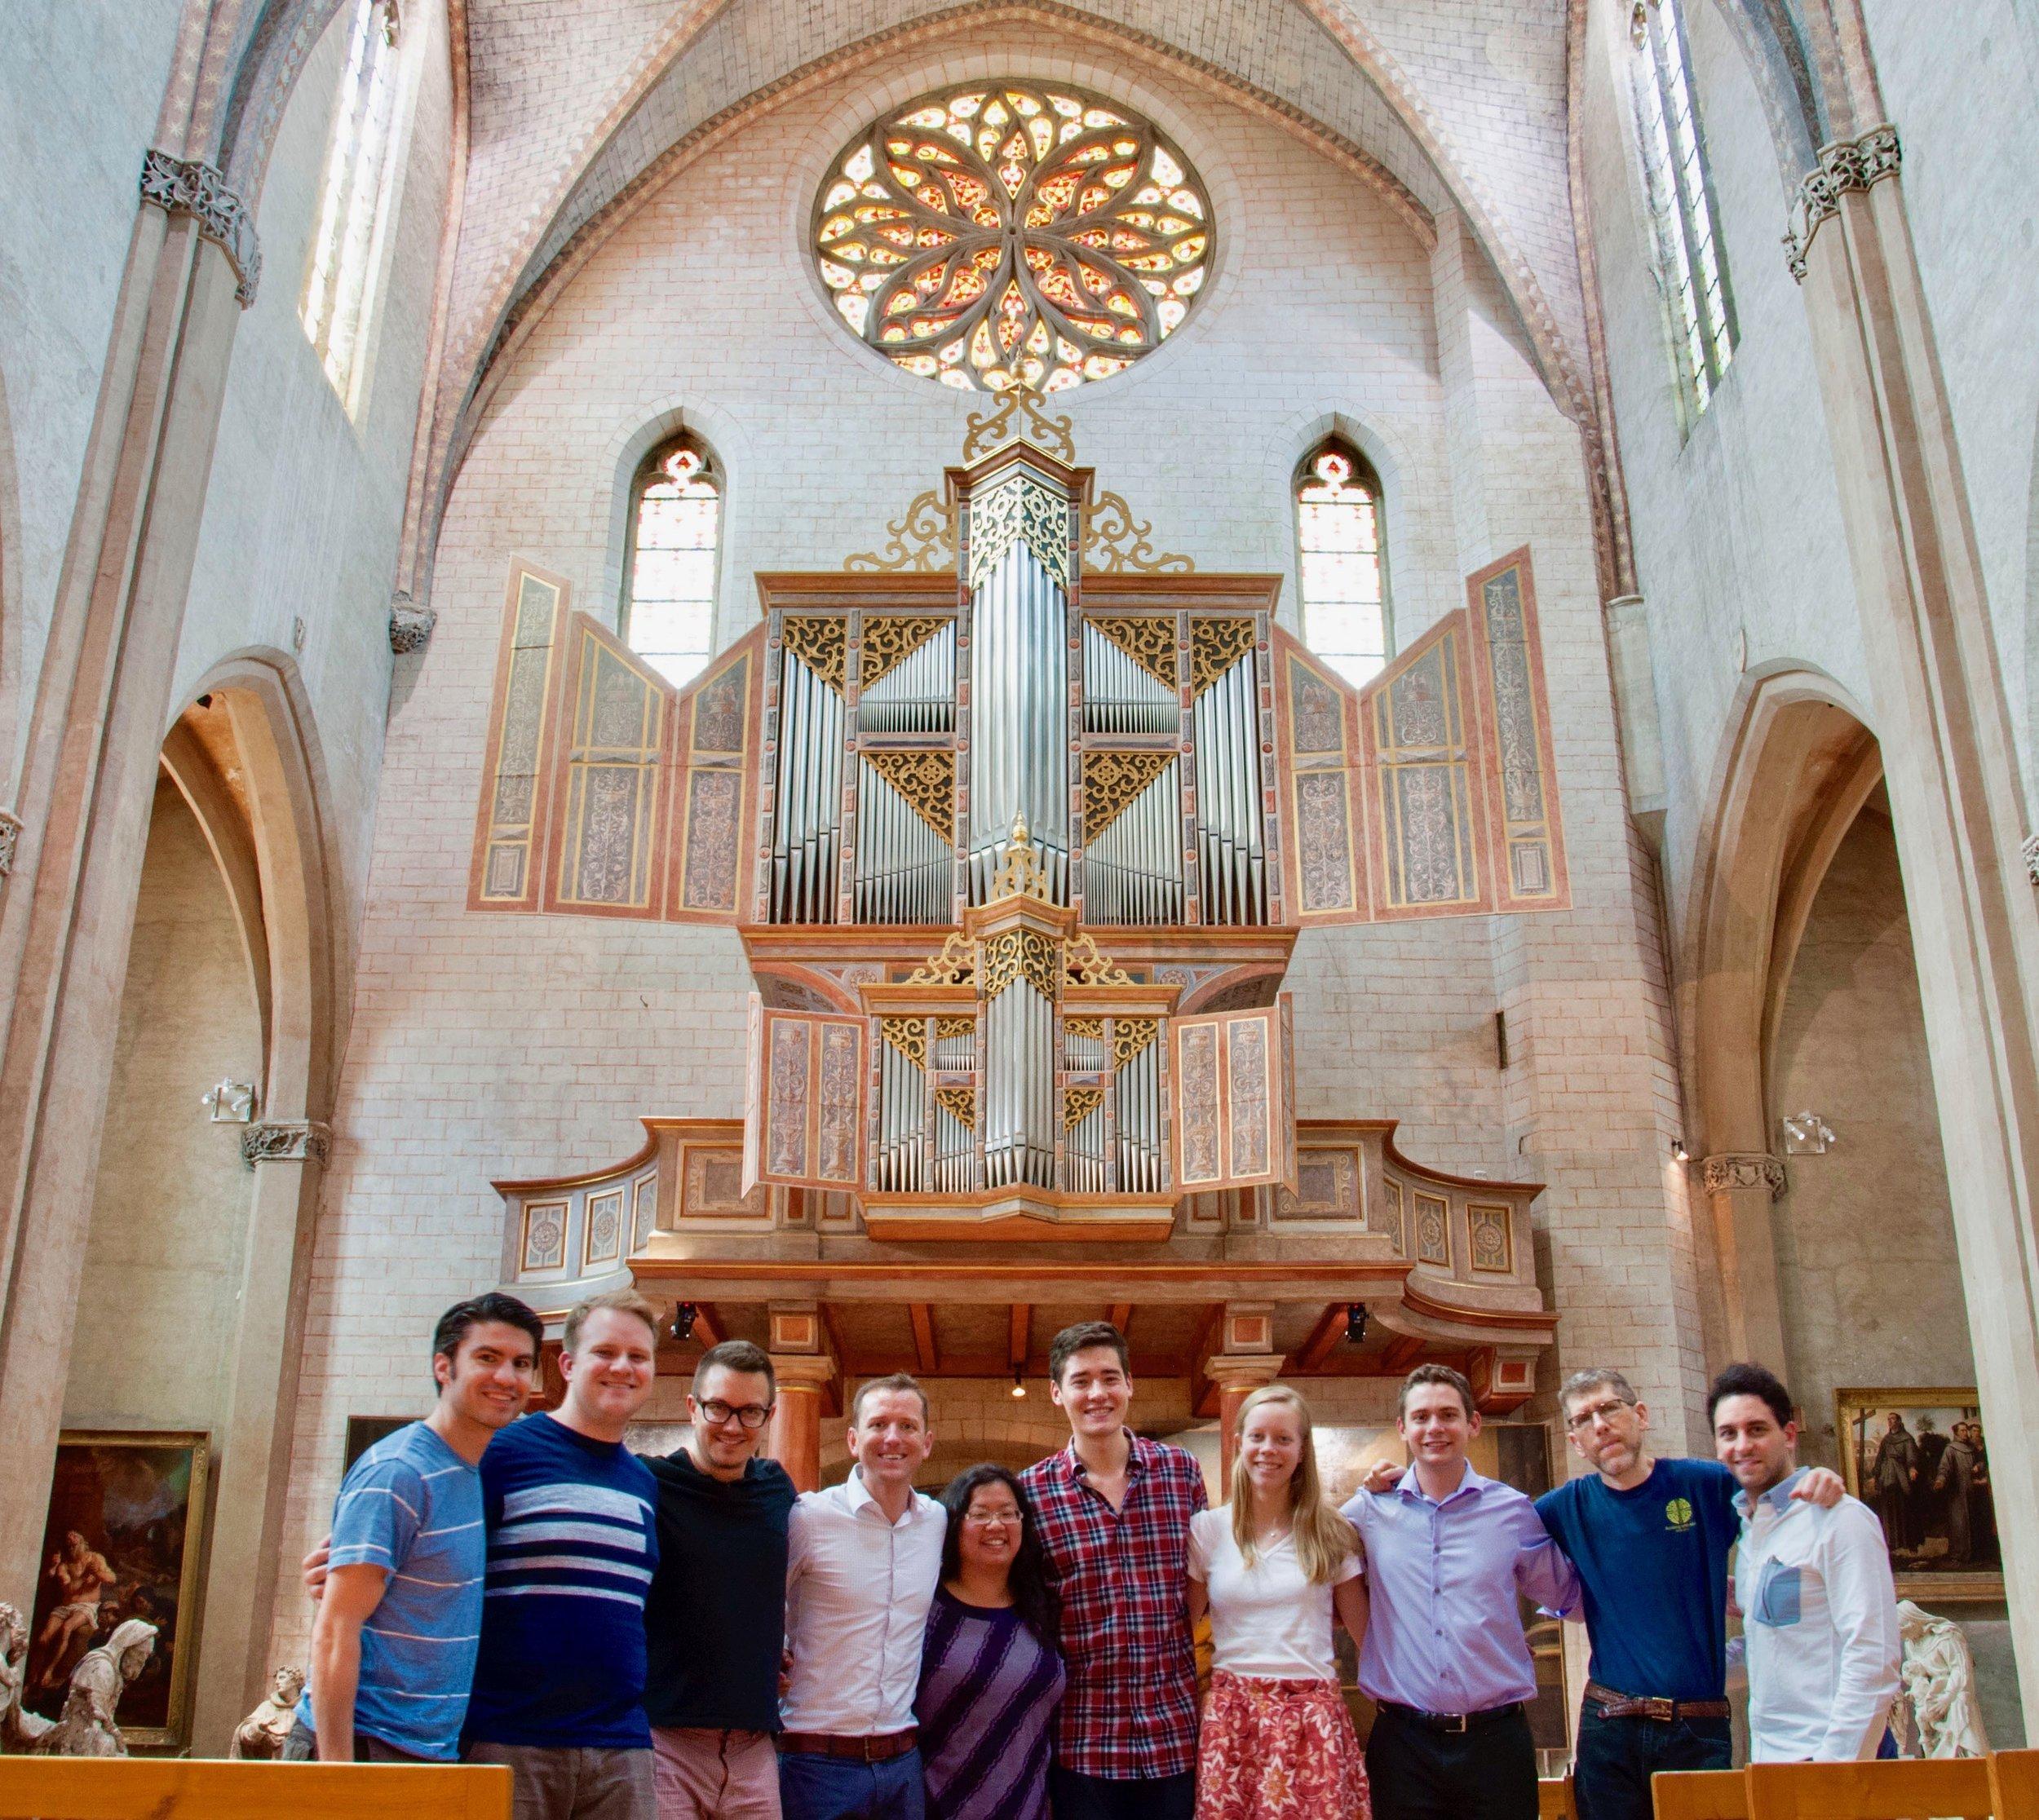 Boston Organ Studio members pose before the Ahrend organ in Toulouse.